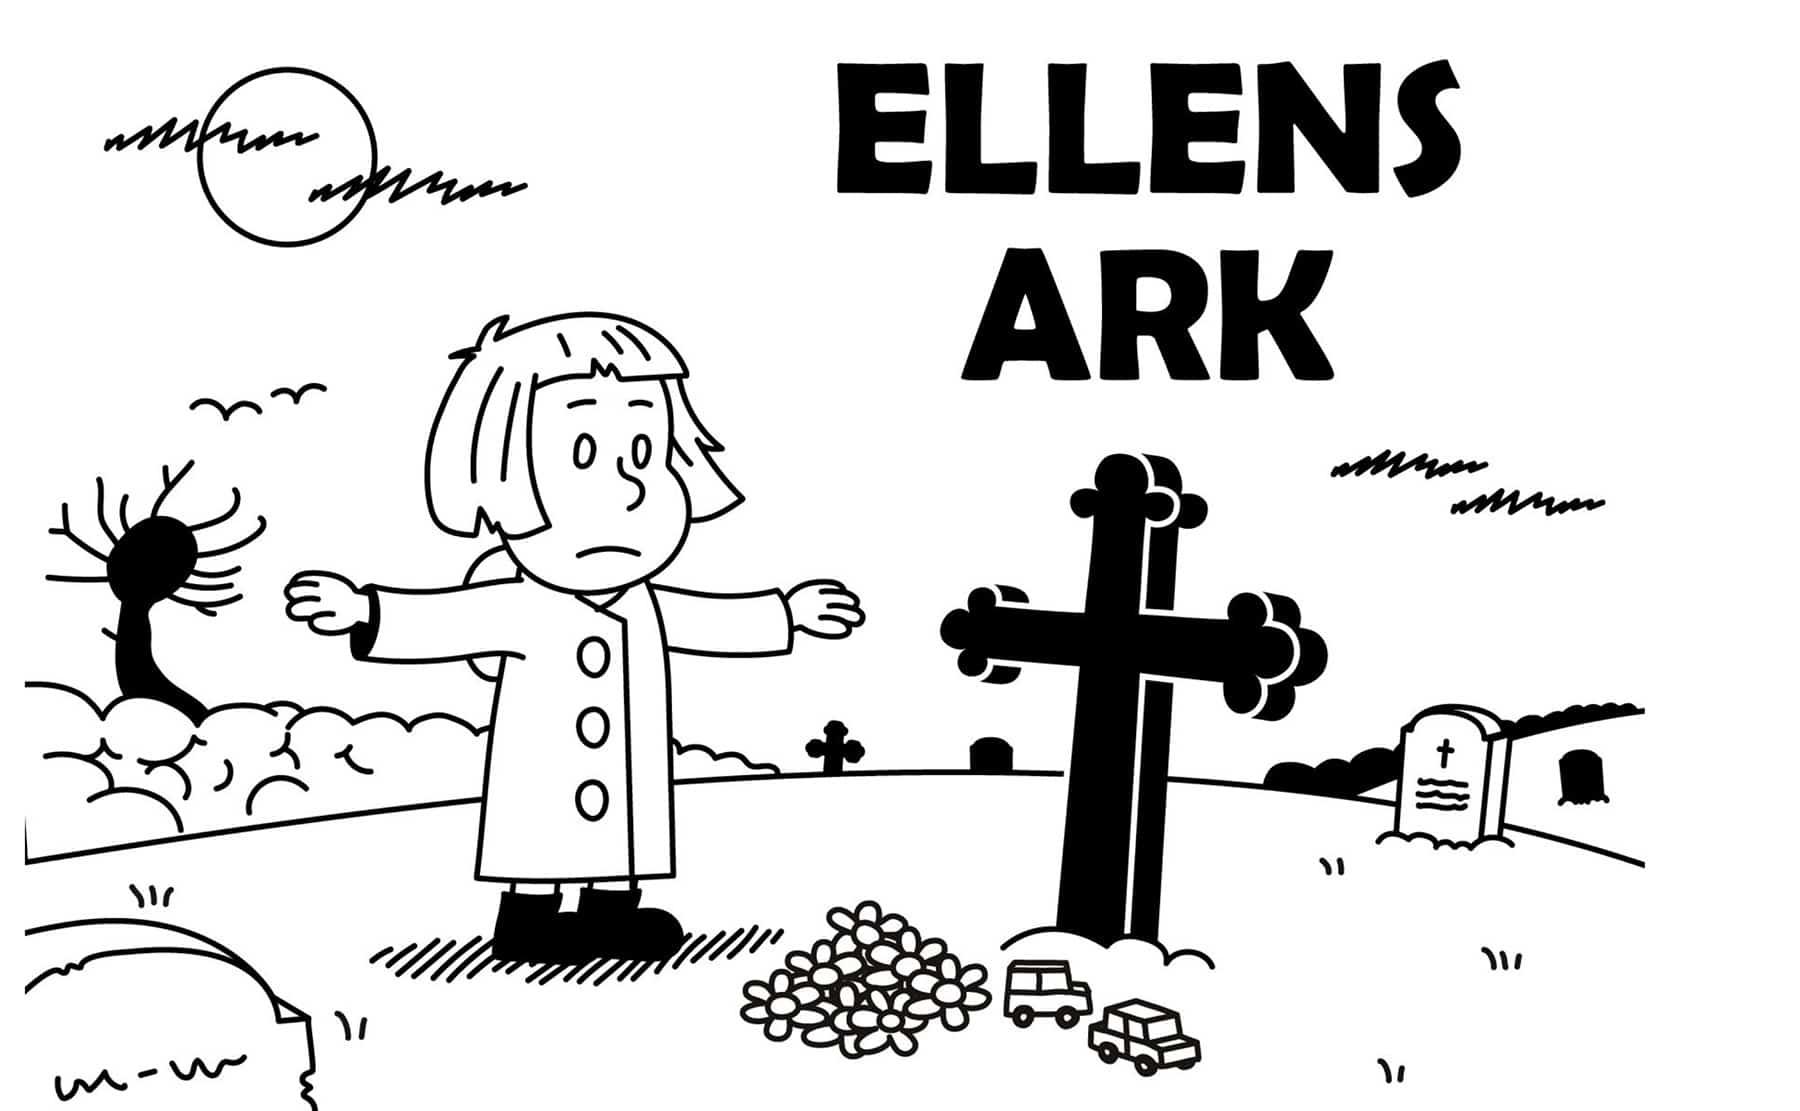 Ellens Ark Poster